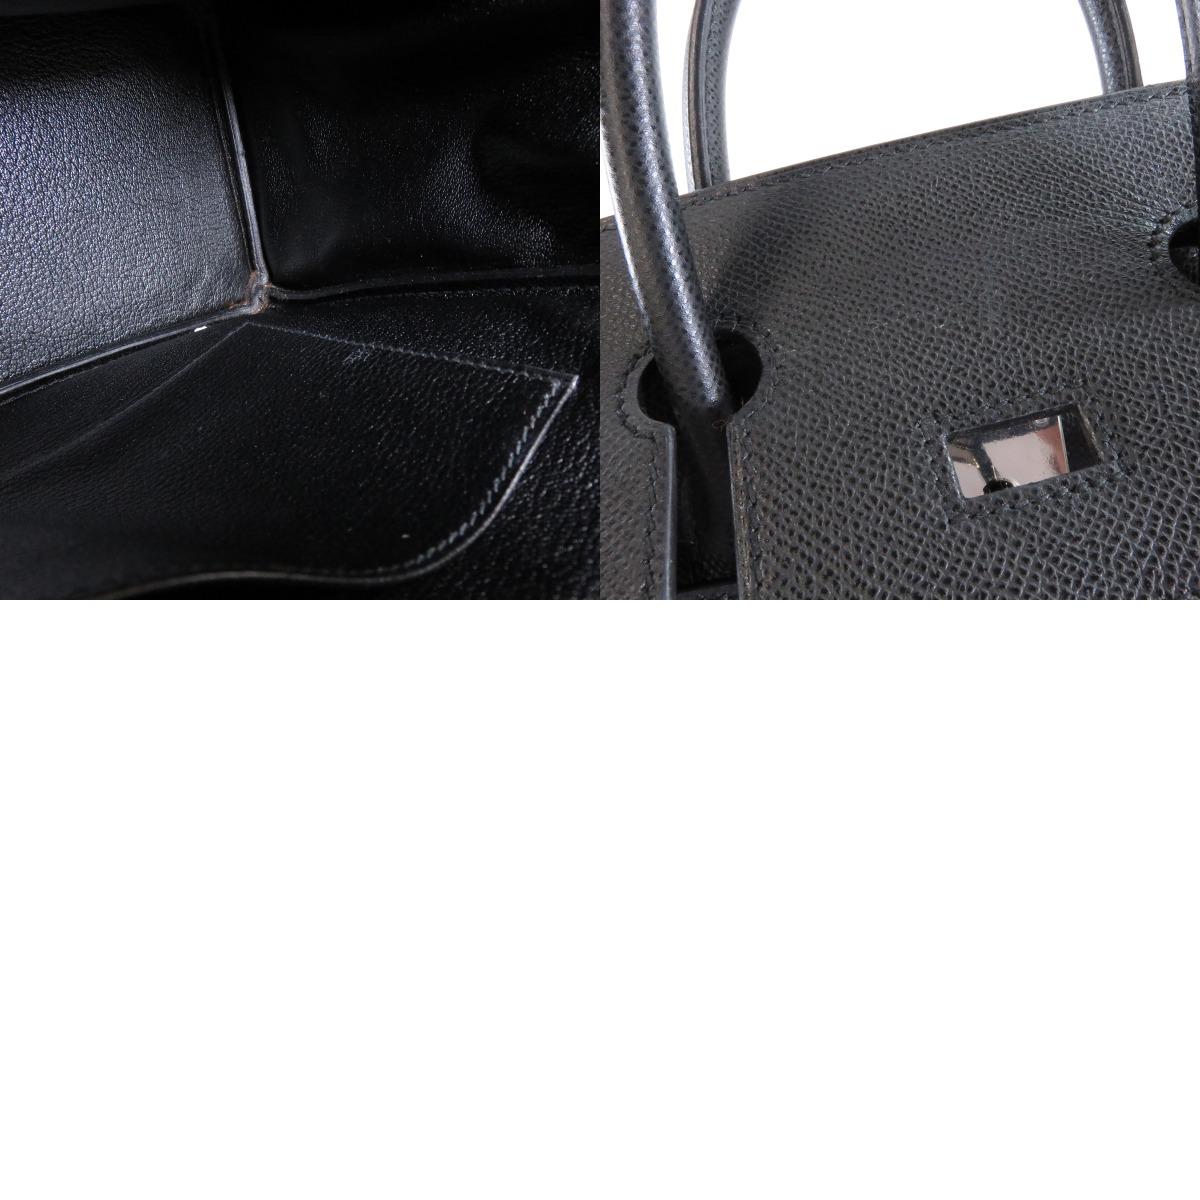 Authentic HERMES  Otakuroa 32 Handbag Epson